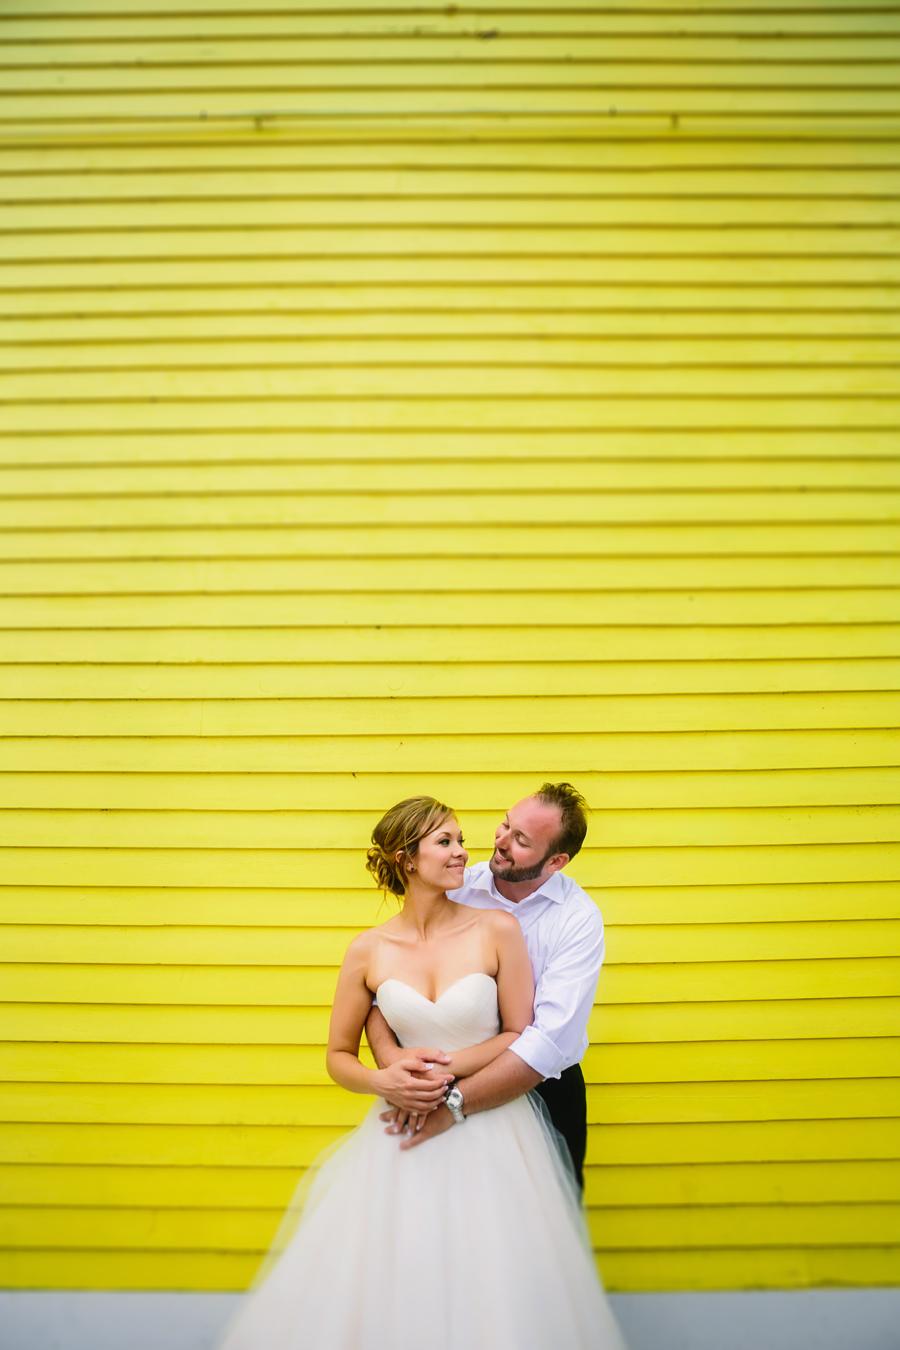 Saugatuck Arts Center Wedding184.jpg